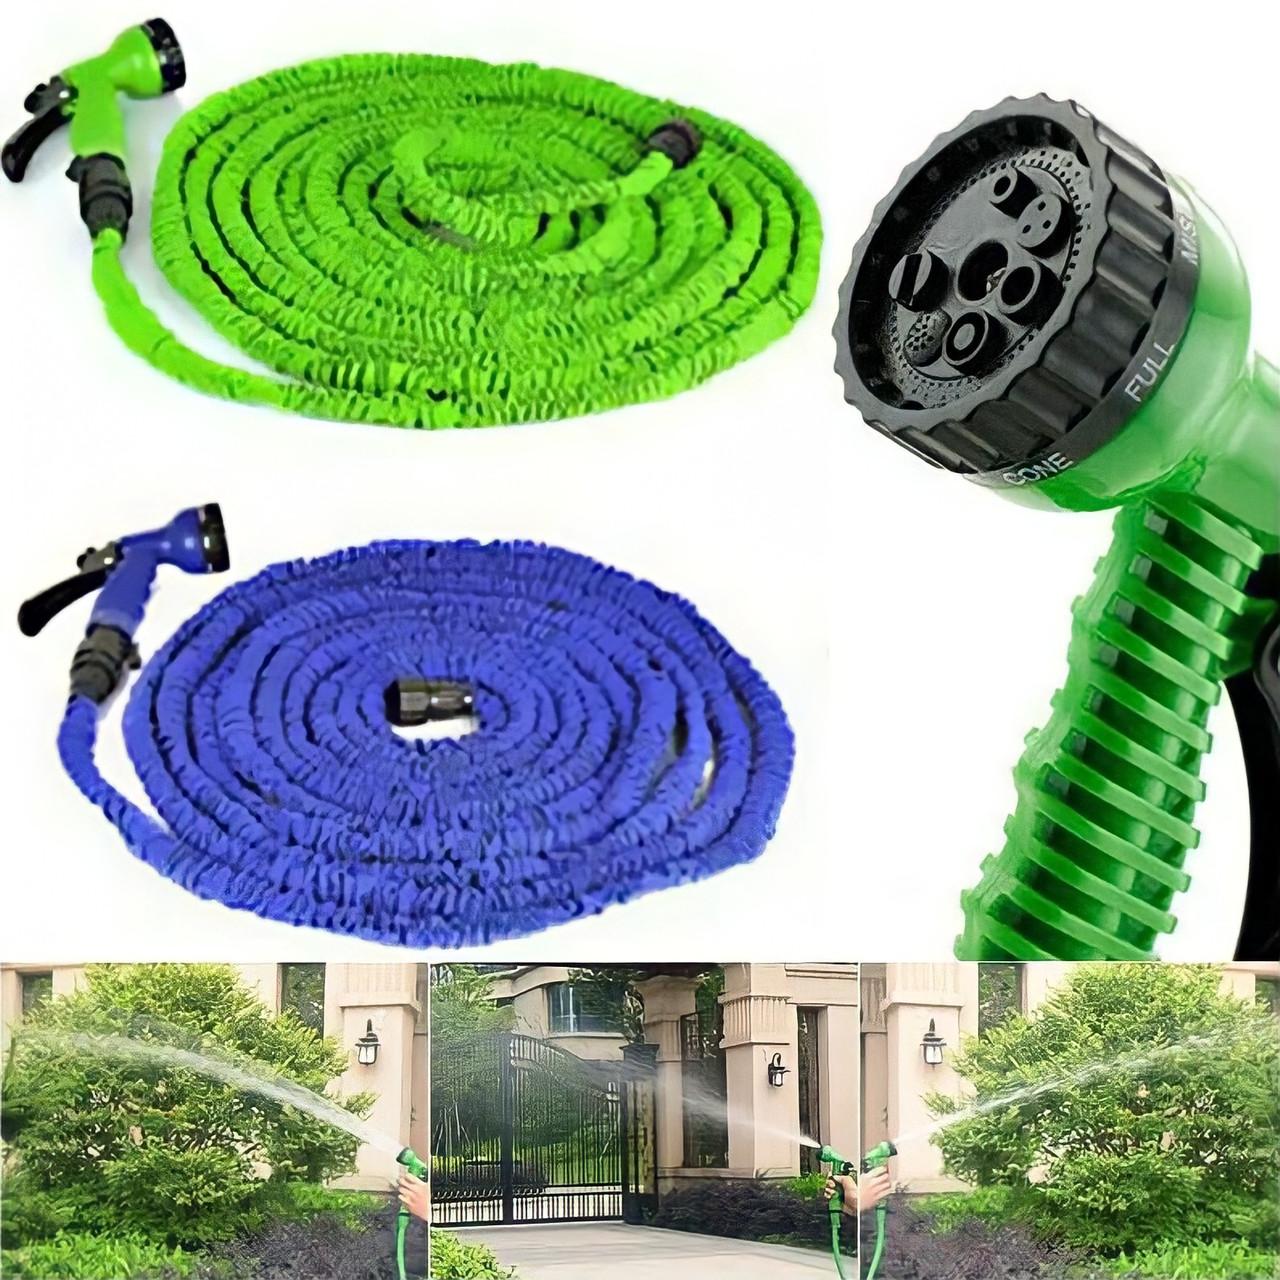 Шланг поливальний X-hose для саду 30 м   xhose шланг для поливу